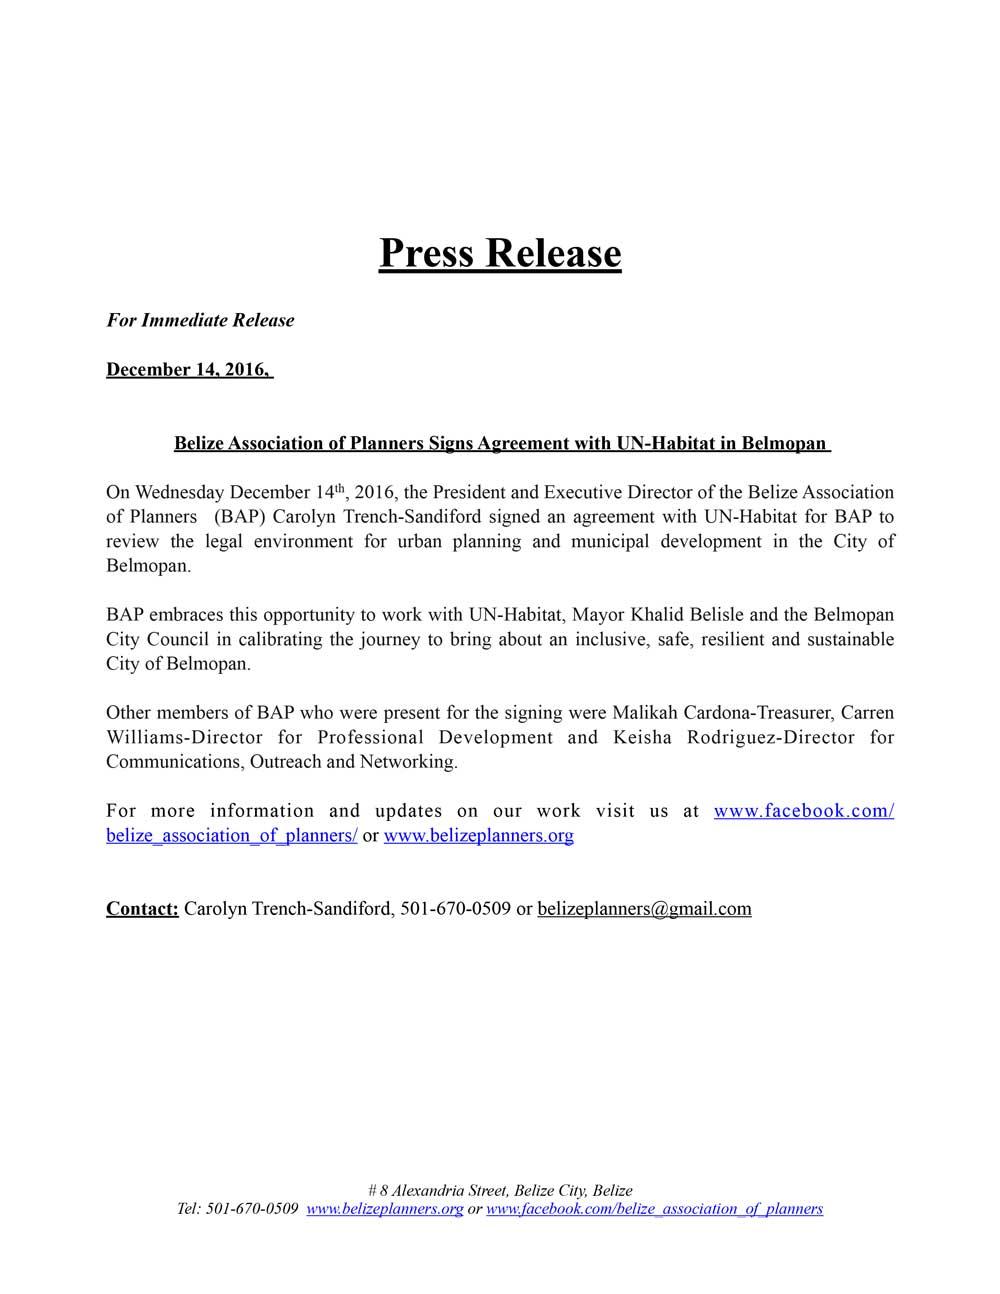 bap-communications-unhabitat-agreement-belmopan-city-council-press-release-12142016